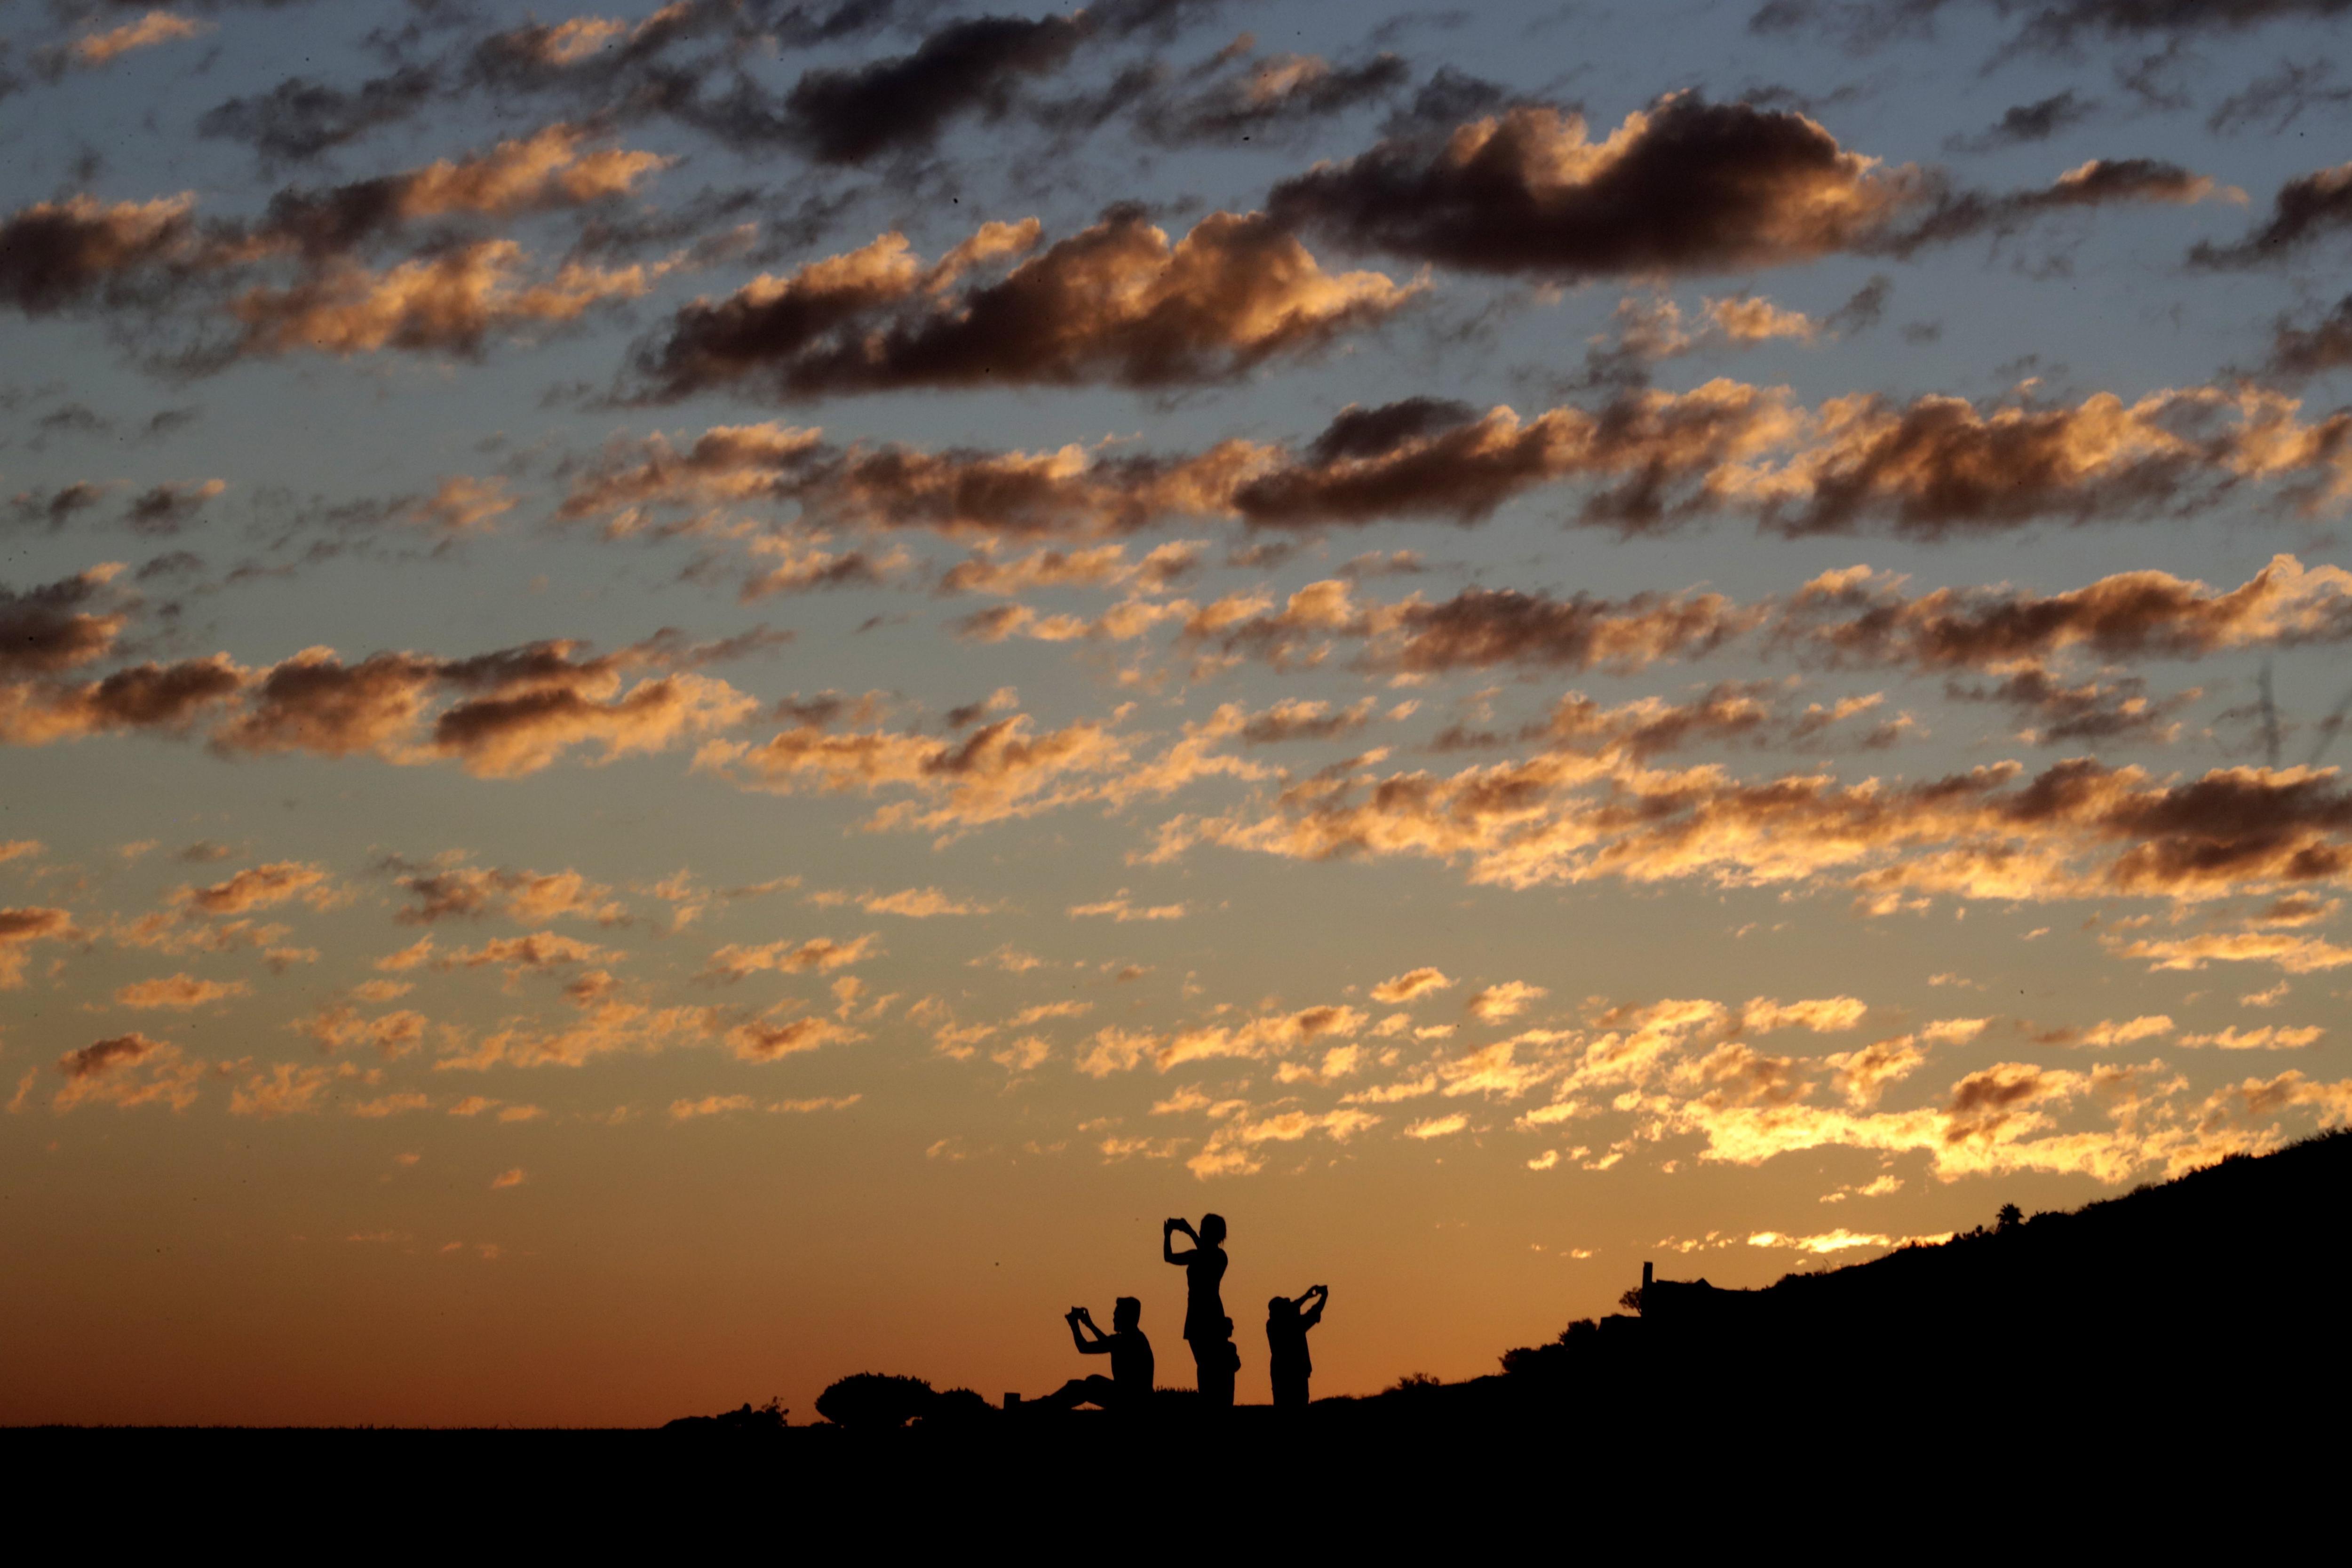 Un grup de persones pren una foto des de la Universitat Pepperdine, a Malibú, Califòrnia, EUA. /MIKE NELSON